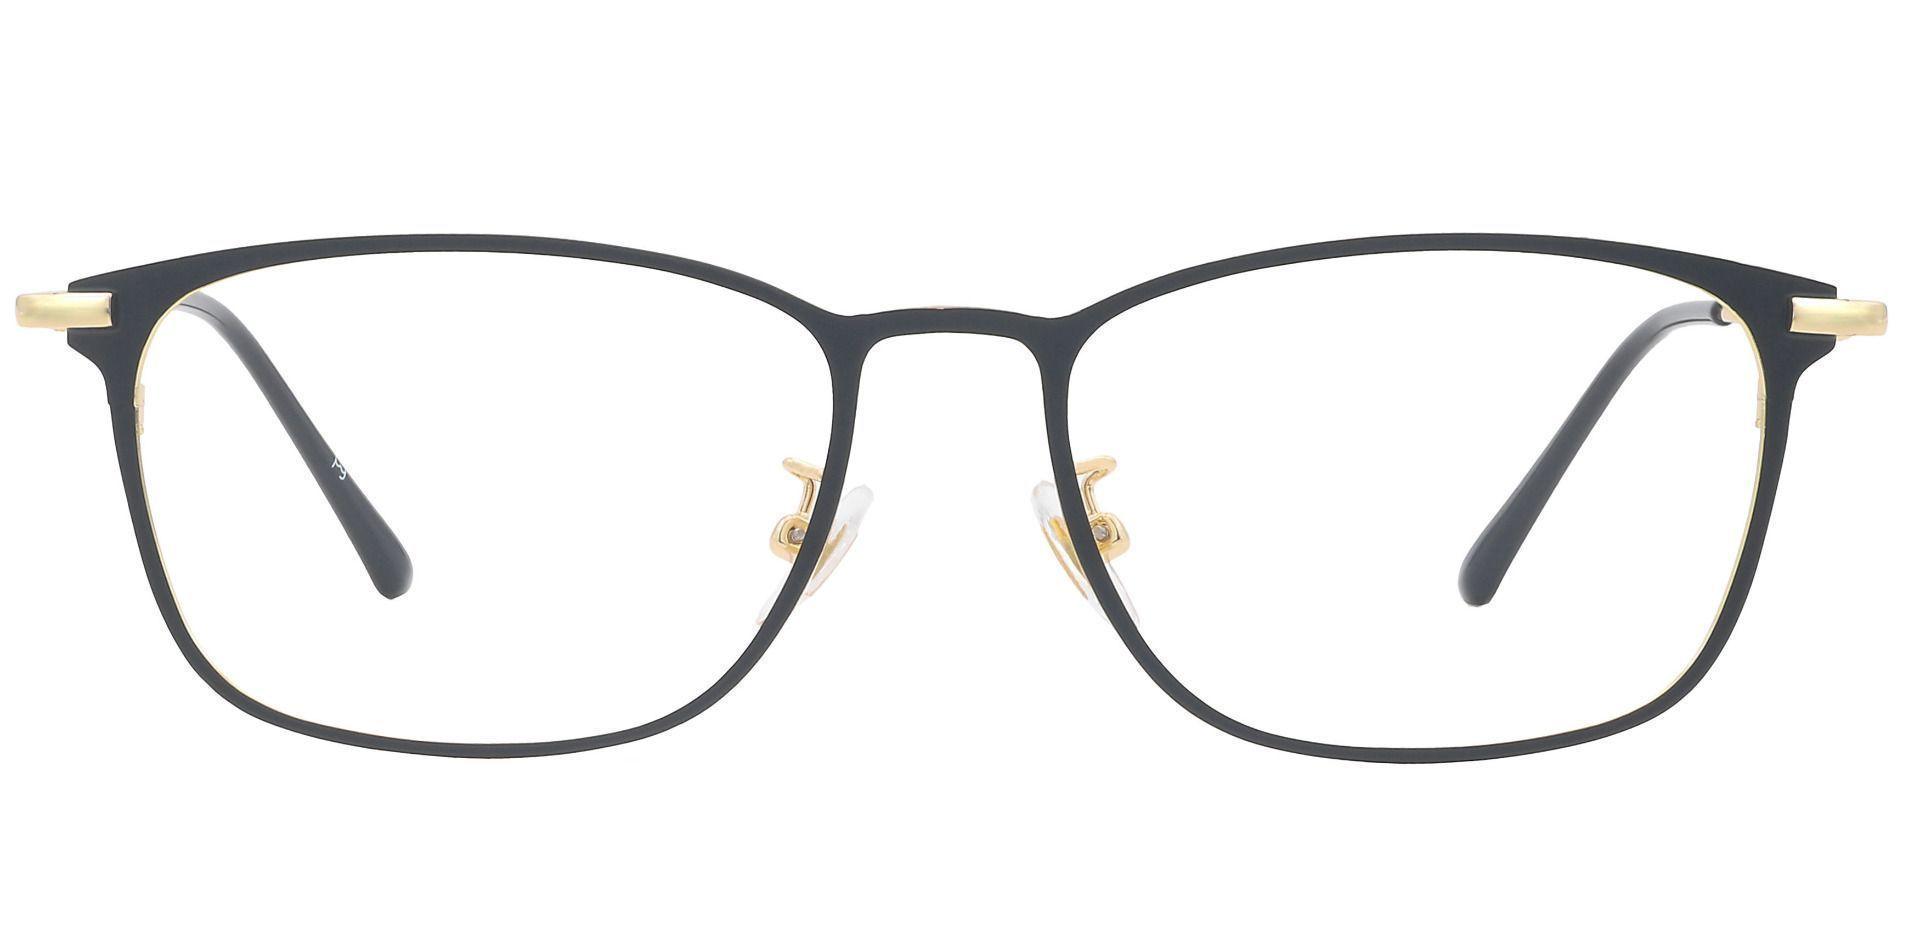 Jade Oval Progressive Glasses - Yellow